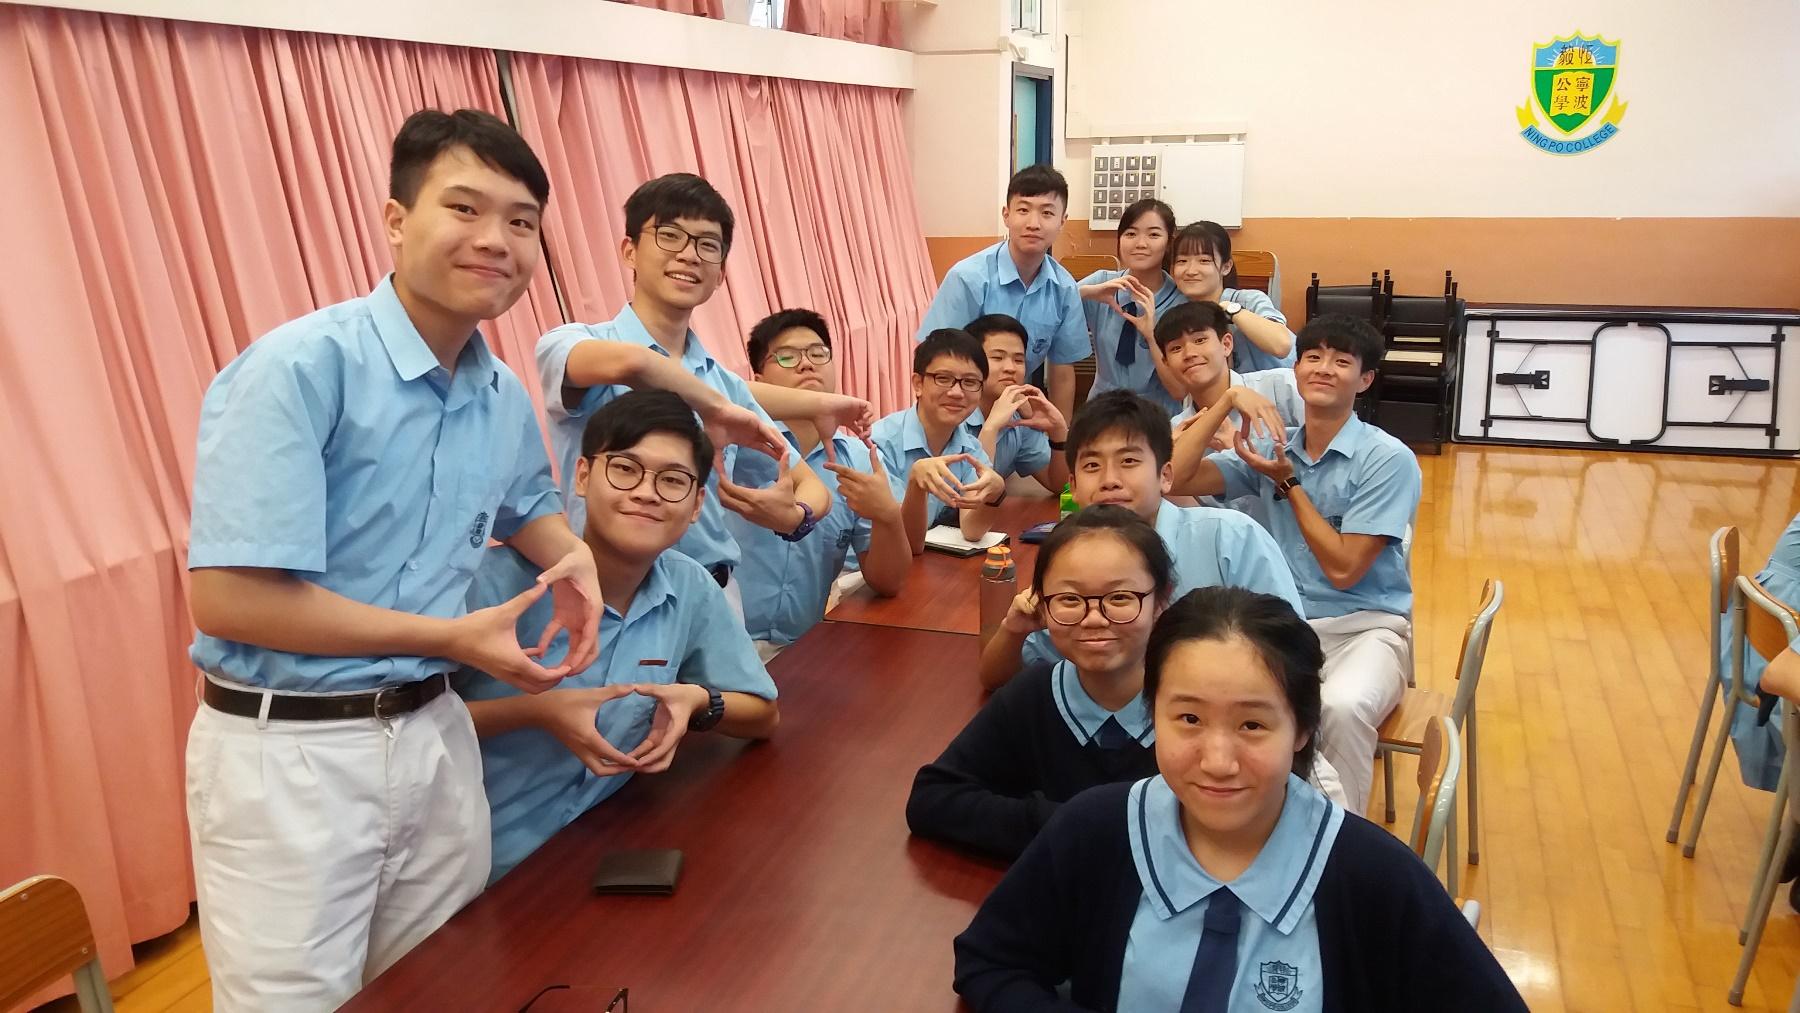 http://npc.edu.hk/sites/default/files/20180919_134317.jpg